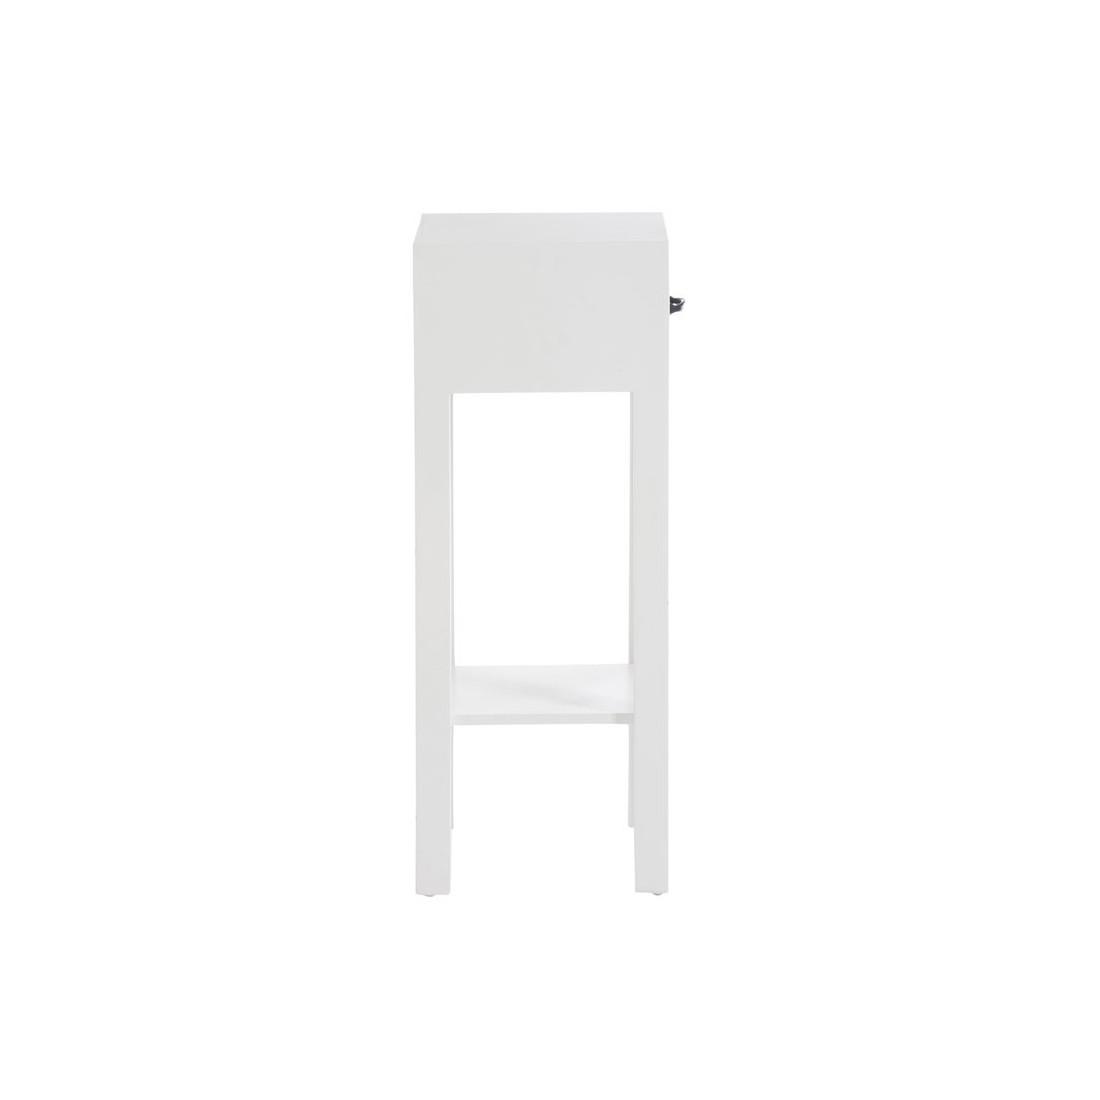 Sellette 1 tiroir bois blanc et naturel canon univers for Petit meuble tiroir blanc